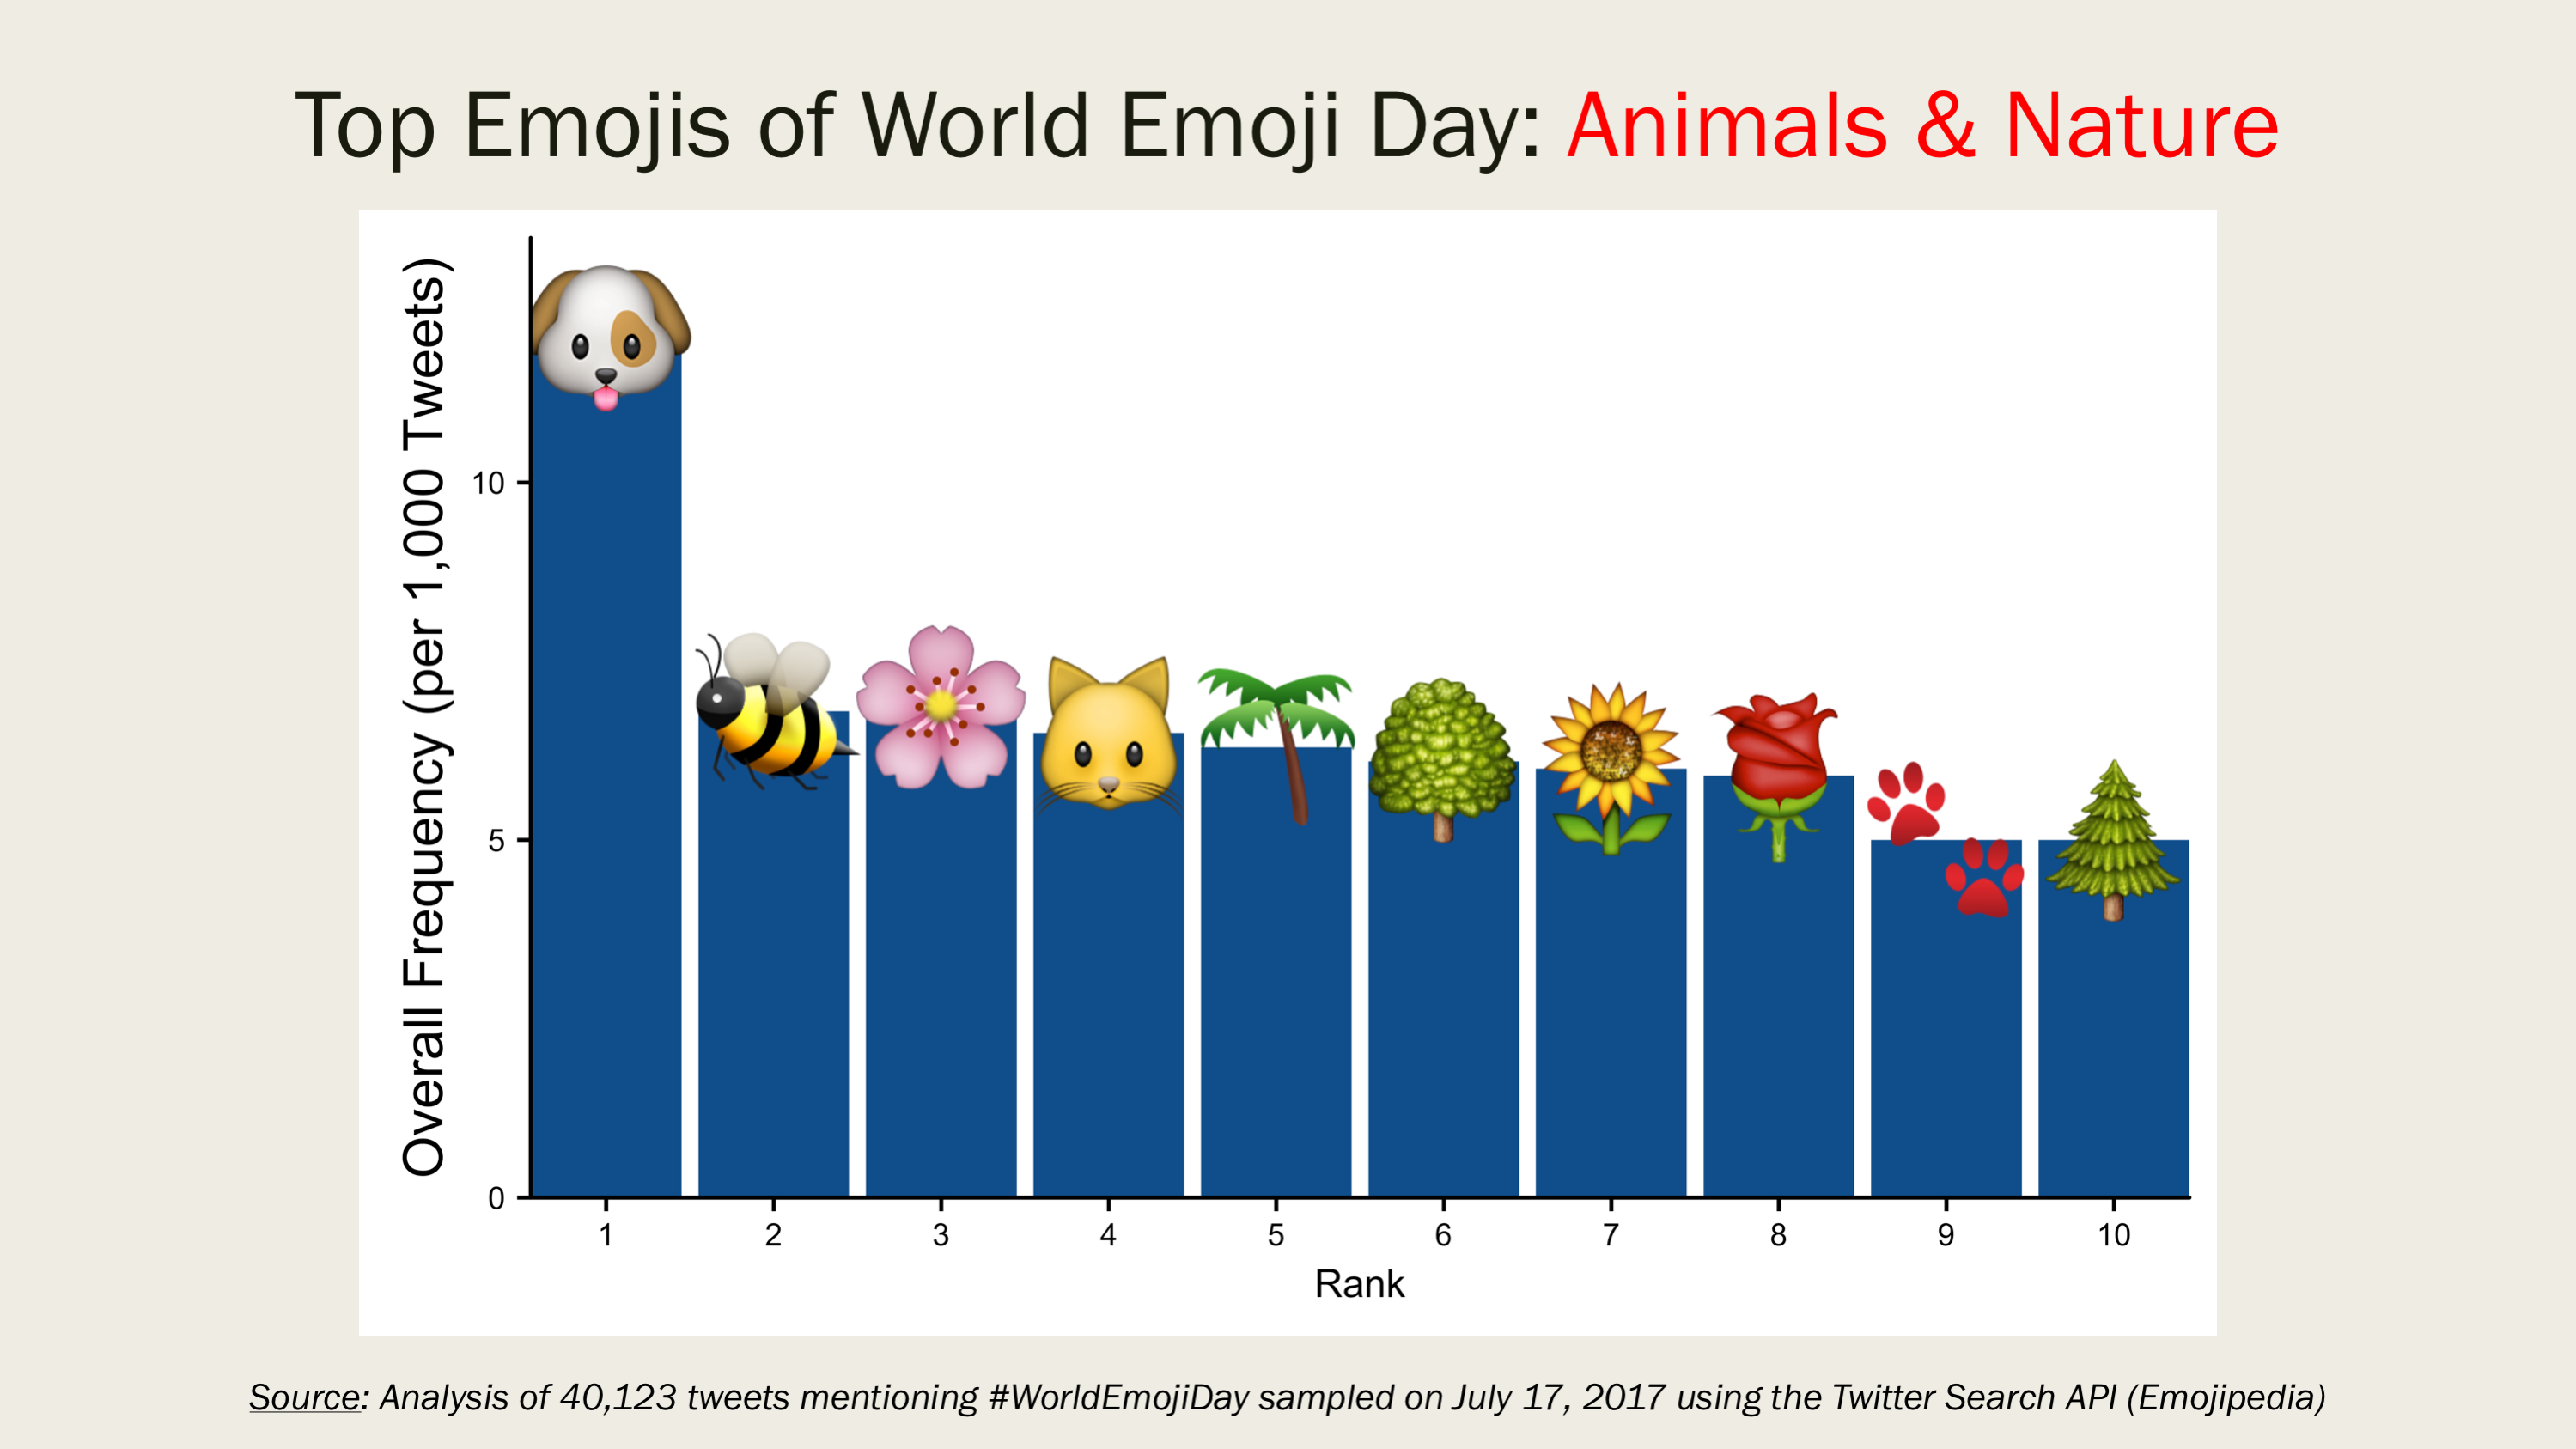 Top Emojis Of World Emoji Day